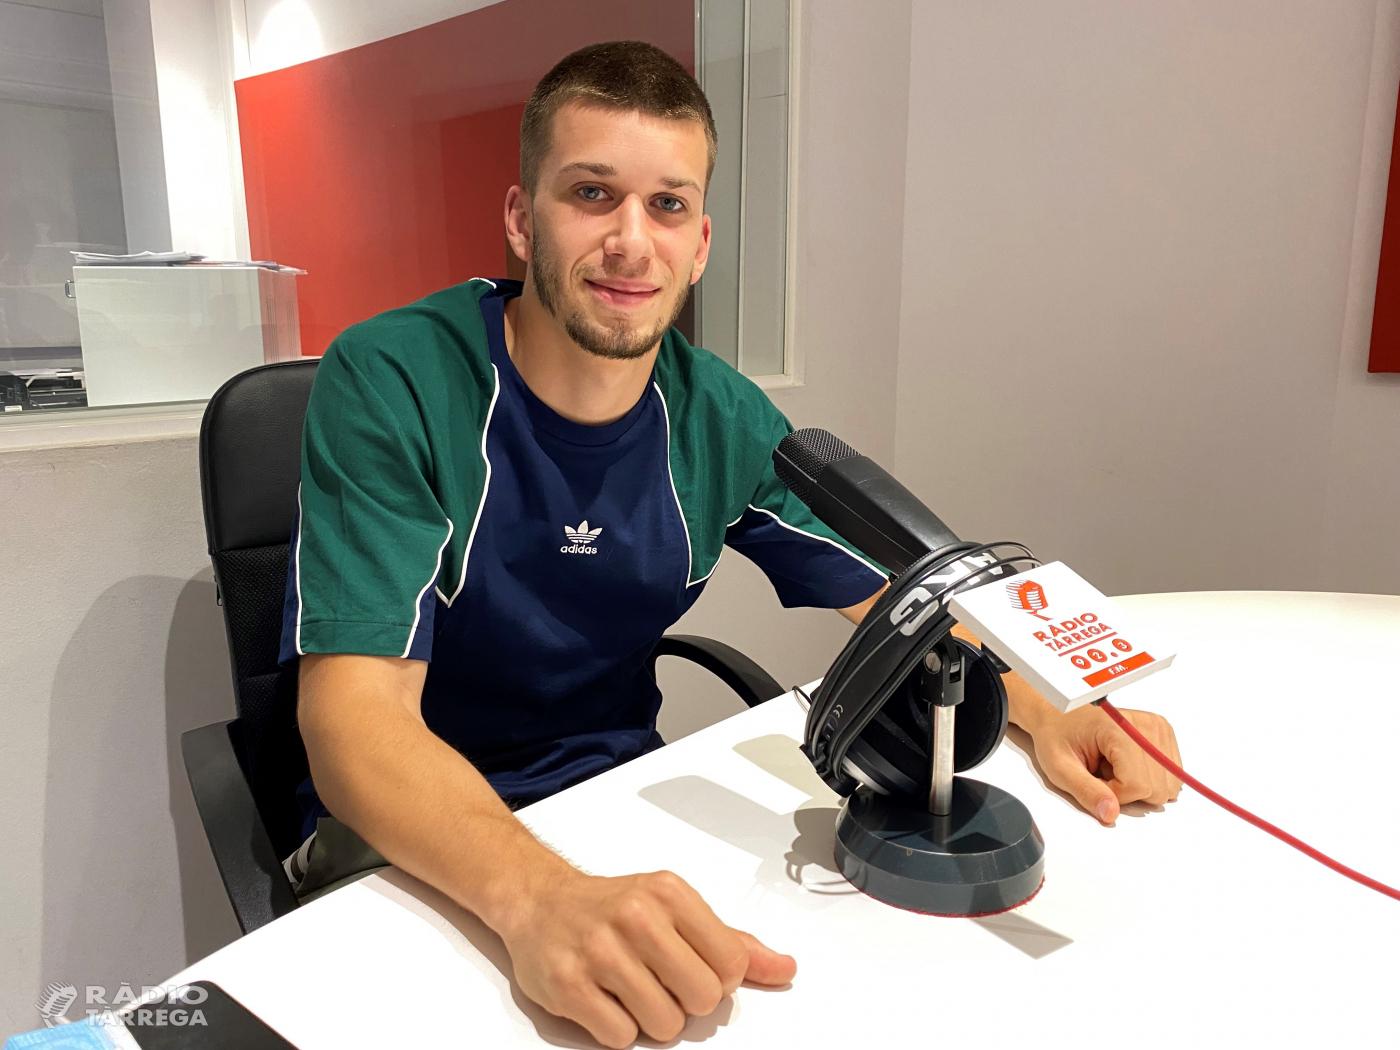 ENTREVISTA amb l'atleta targarí Arnau Monné medallista en els Campionats Europeus sub-23